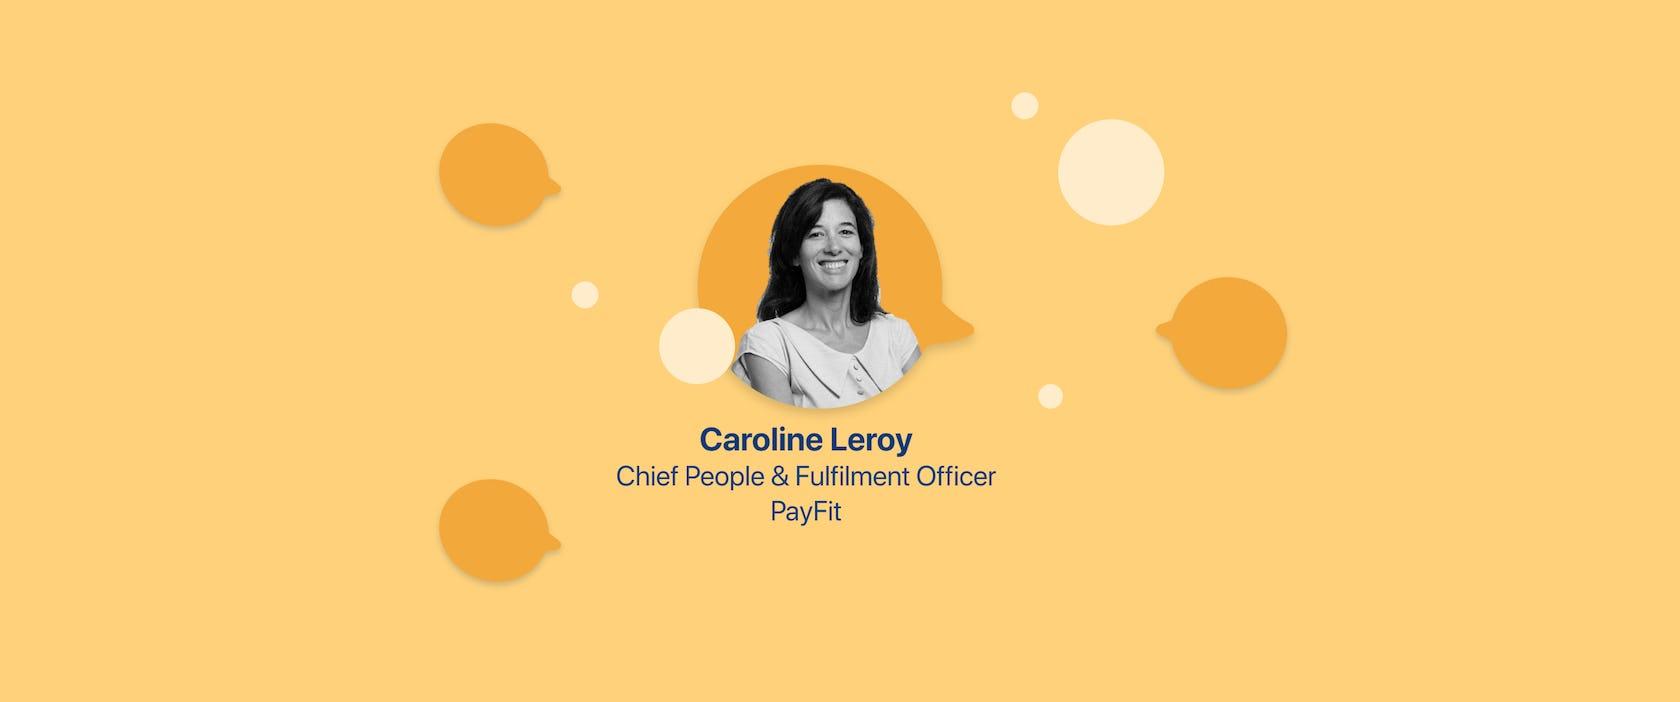 Employee engagement and communication in a post-coronavirus world